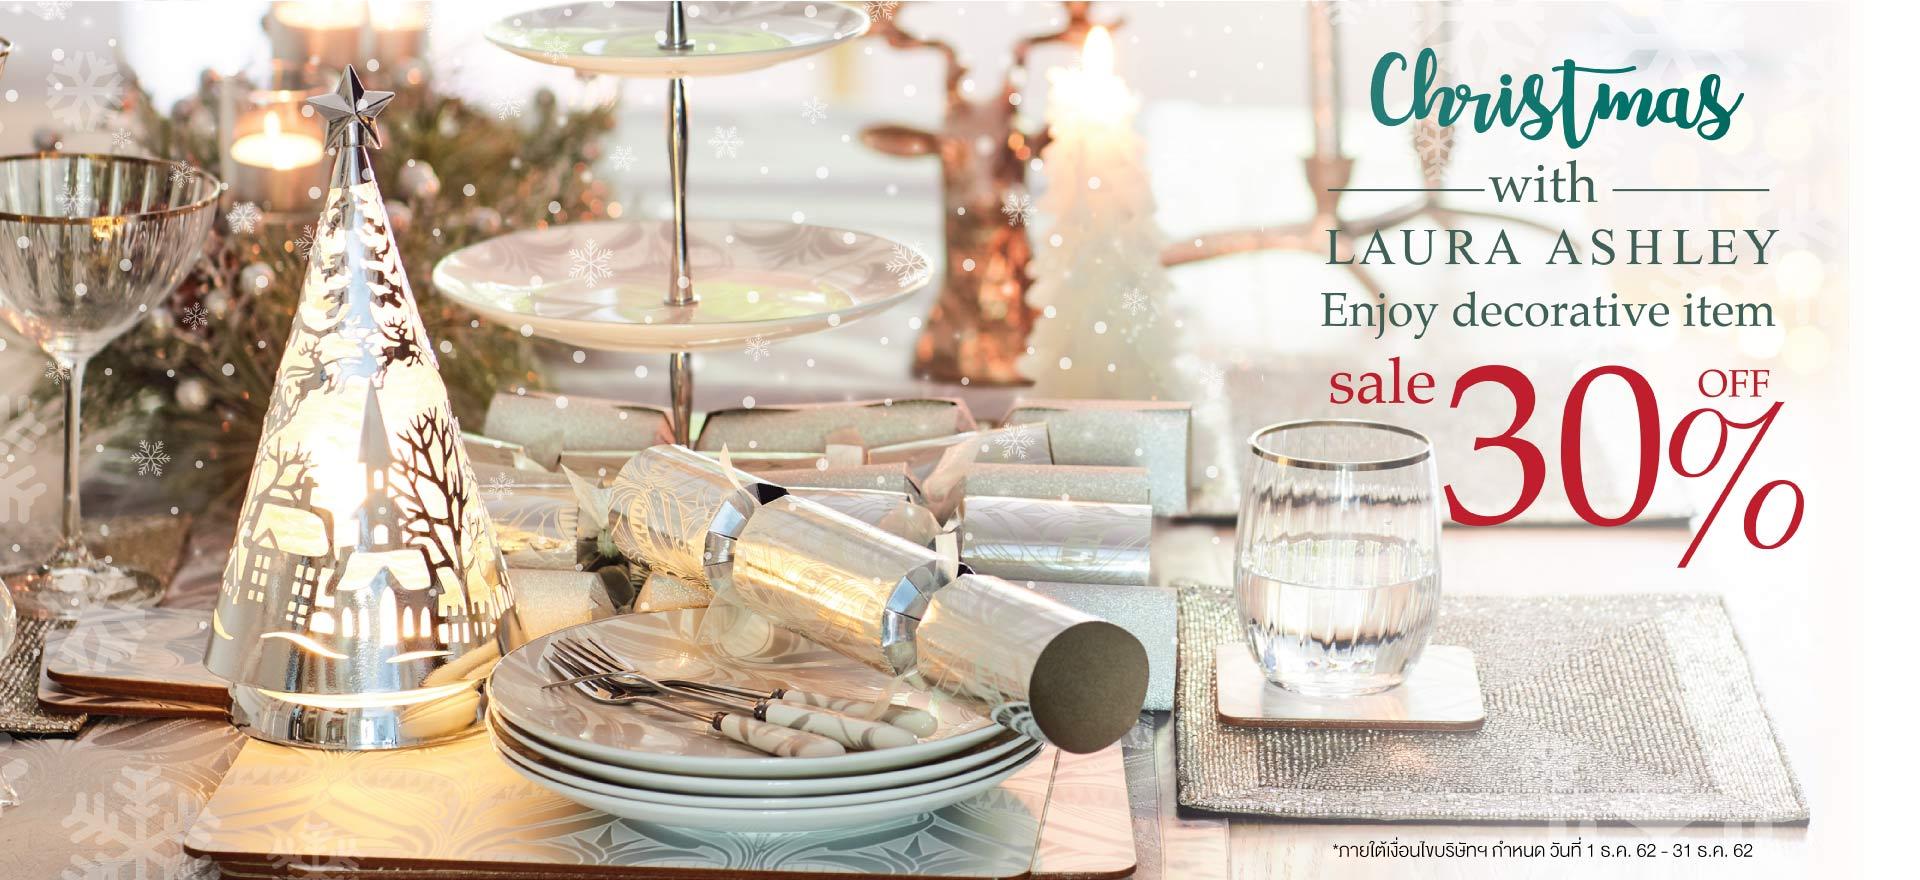 Christmas with LAURA ASHLEY Enjoy Decorative Items Sale 30%